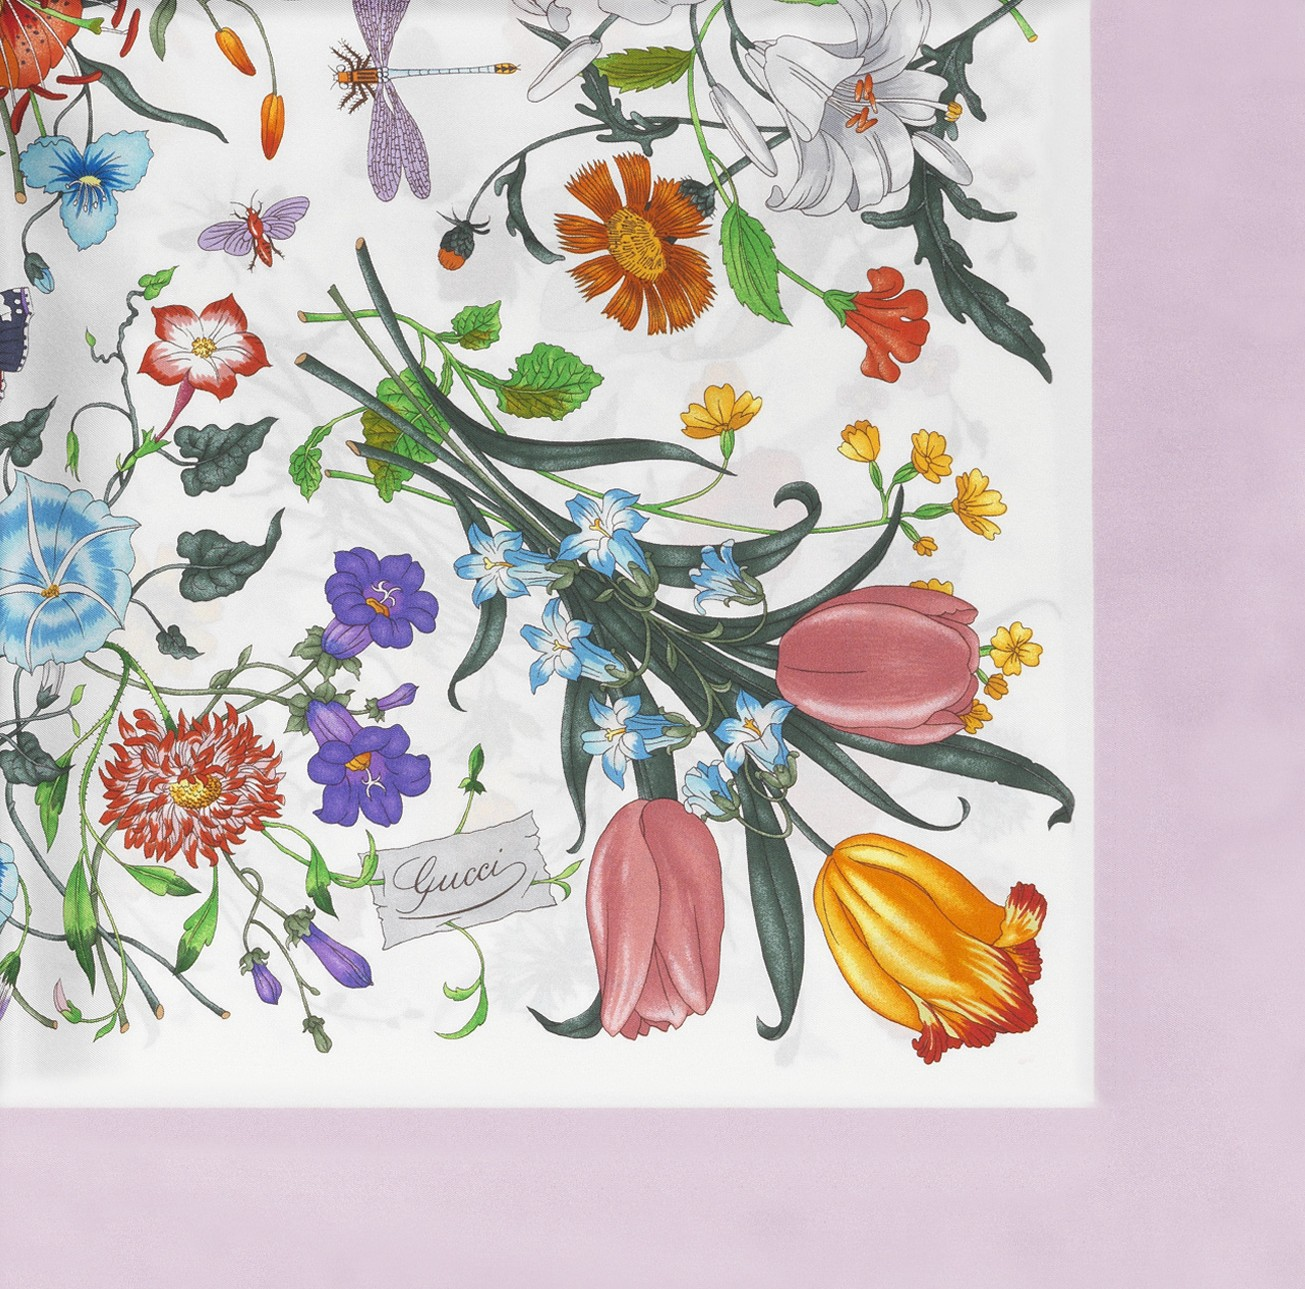 gucci flora scarf